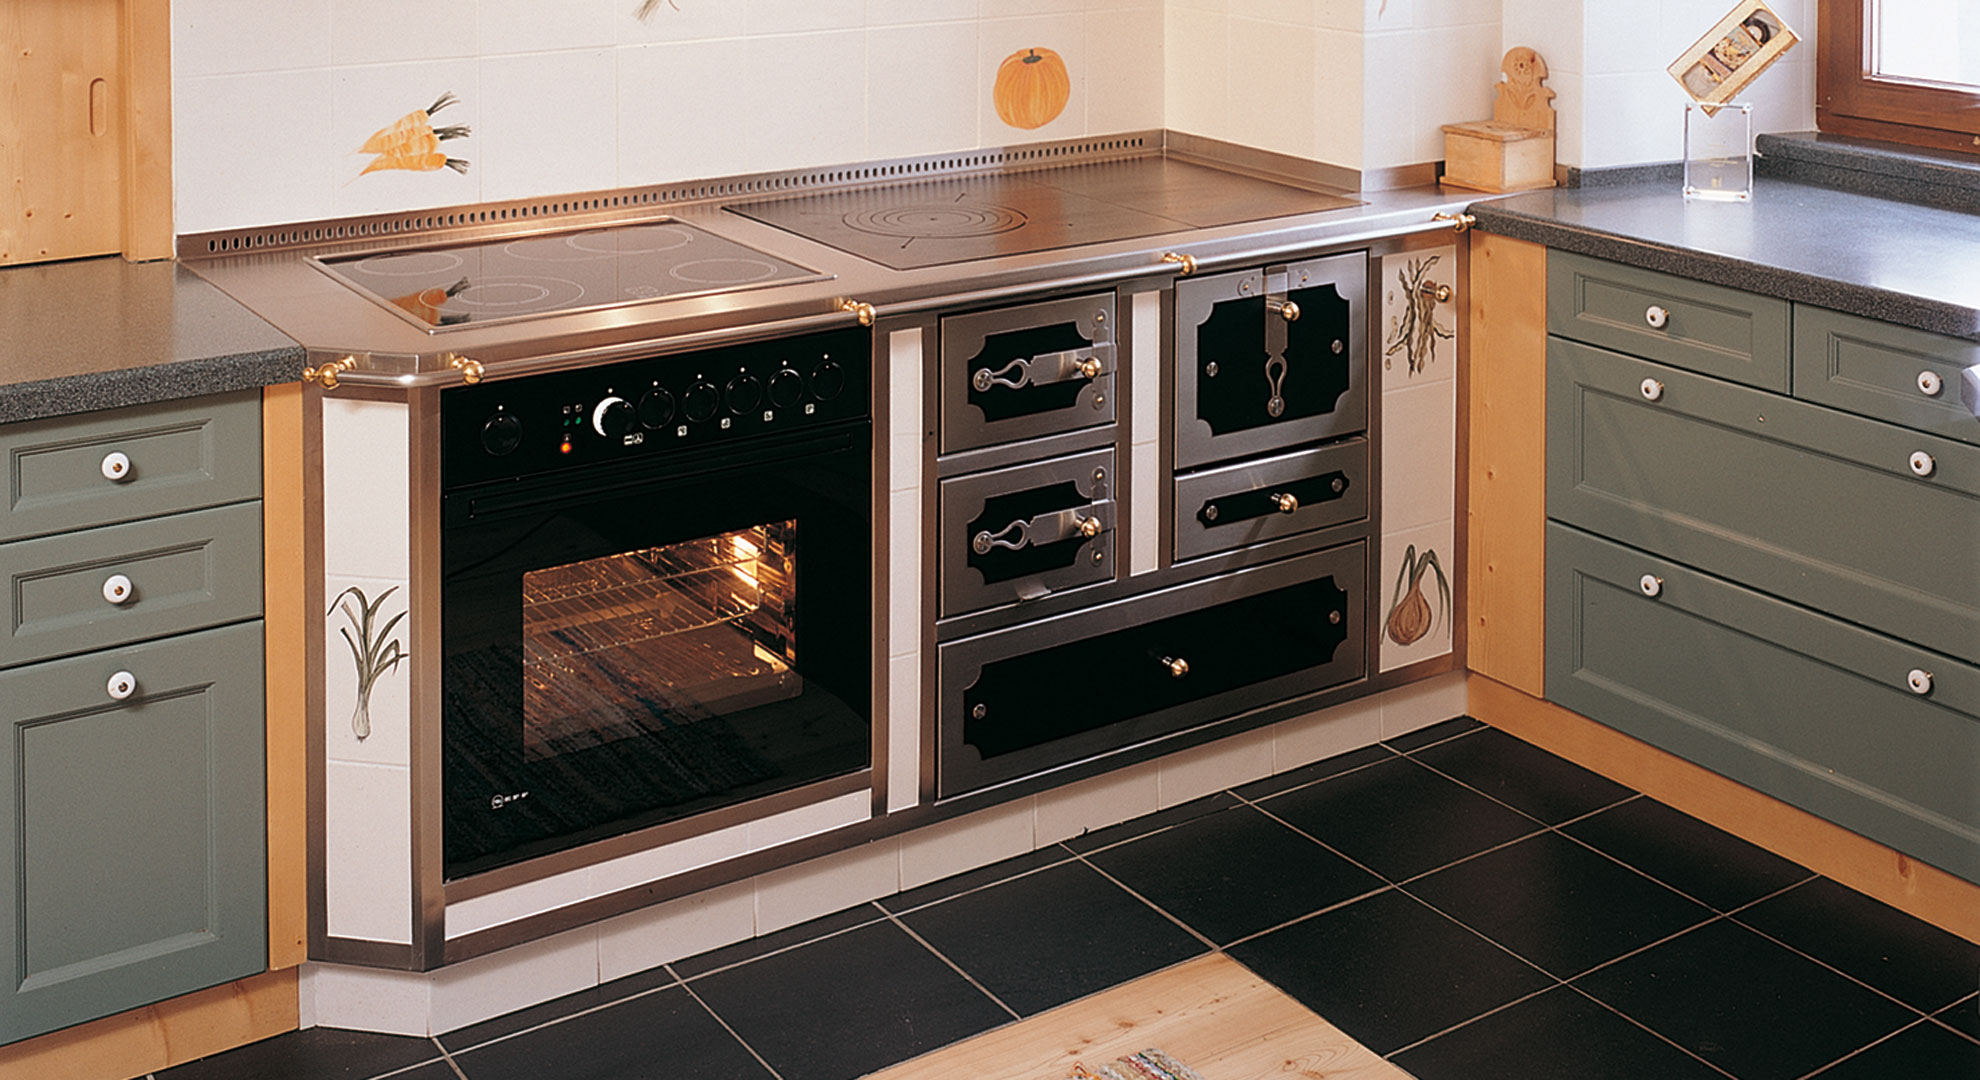 Einbauherd - Ofenbau Koller